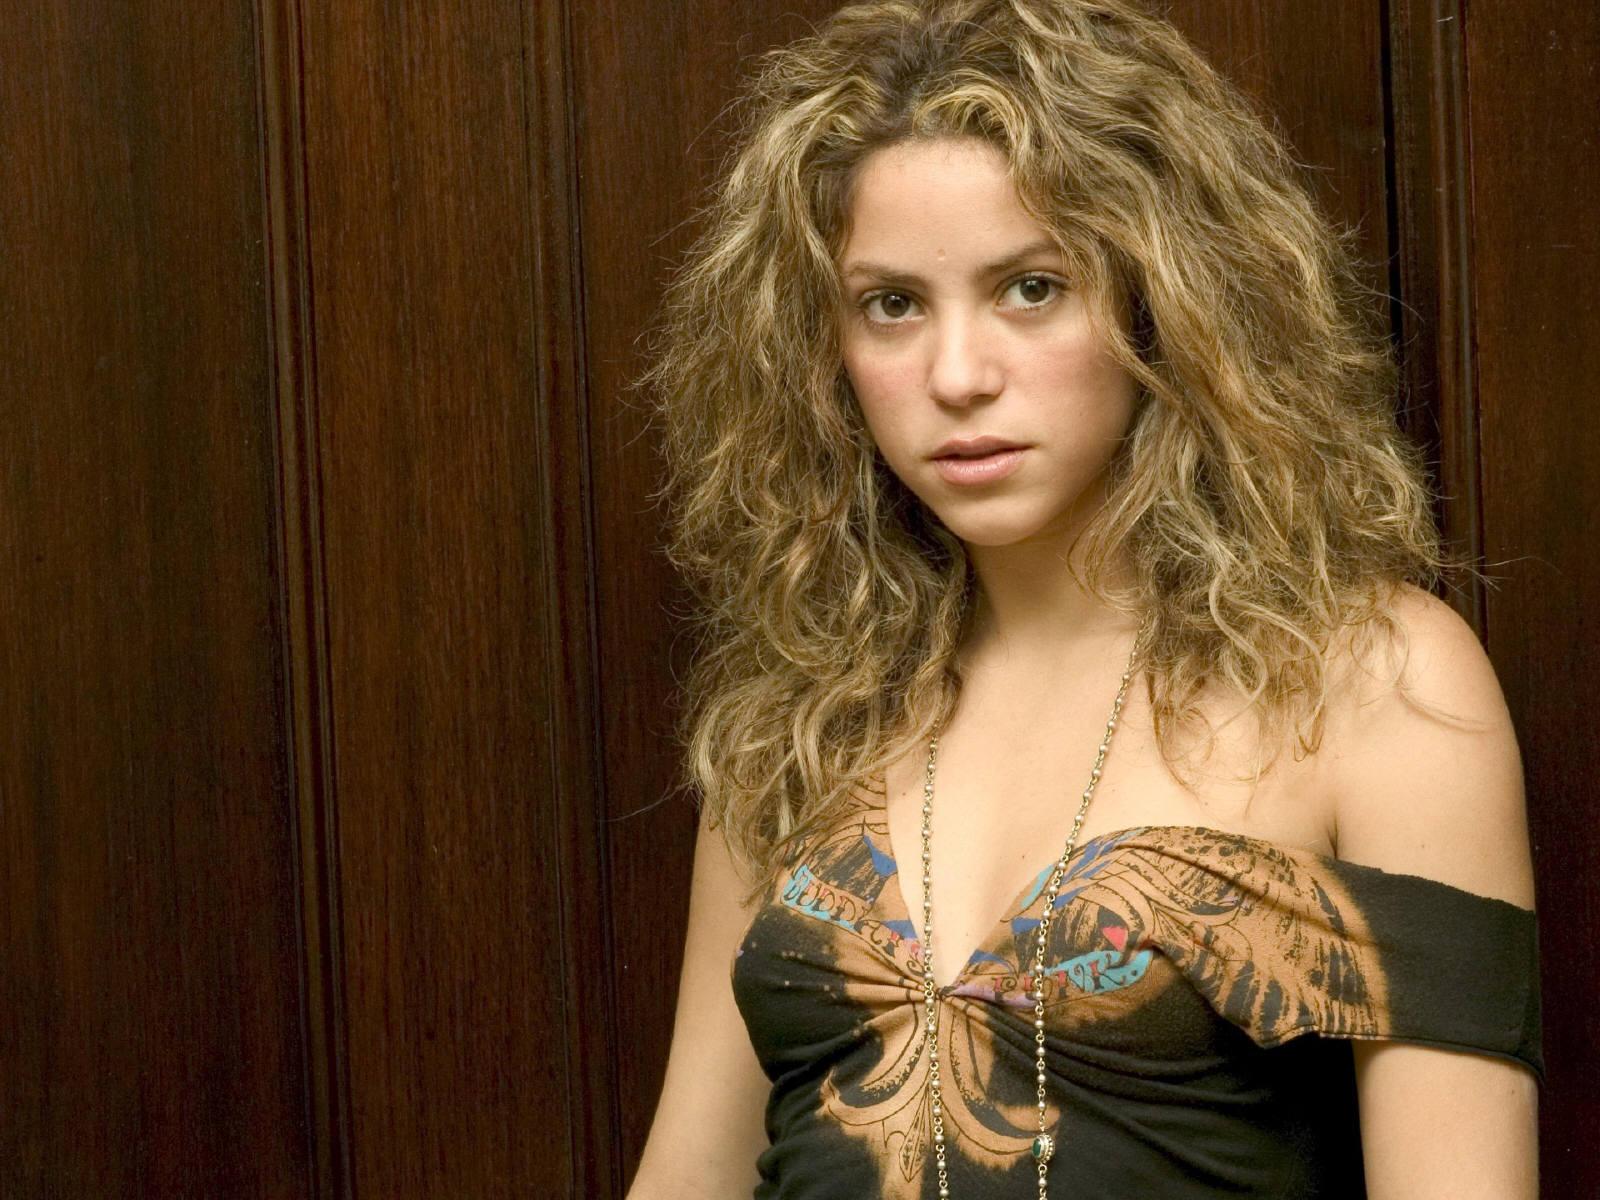 Indian Girl Wallpaper Photo Shakira 2012